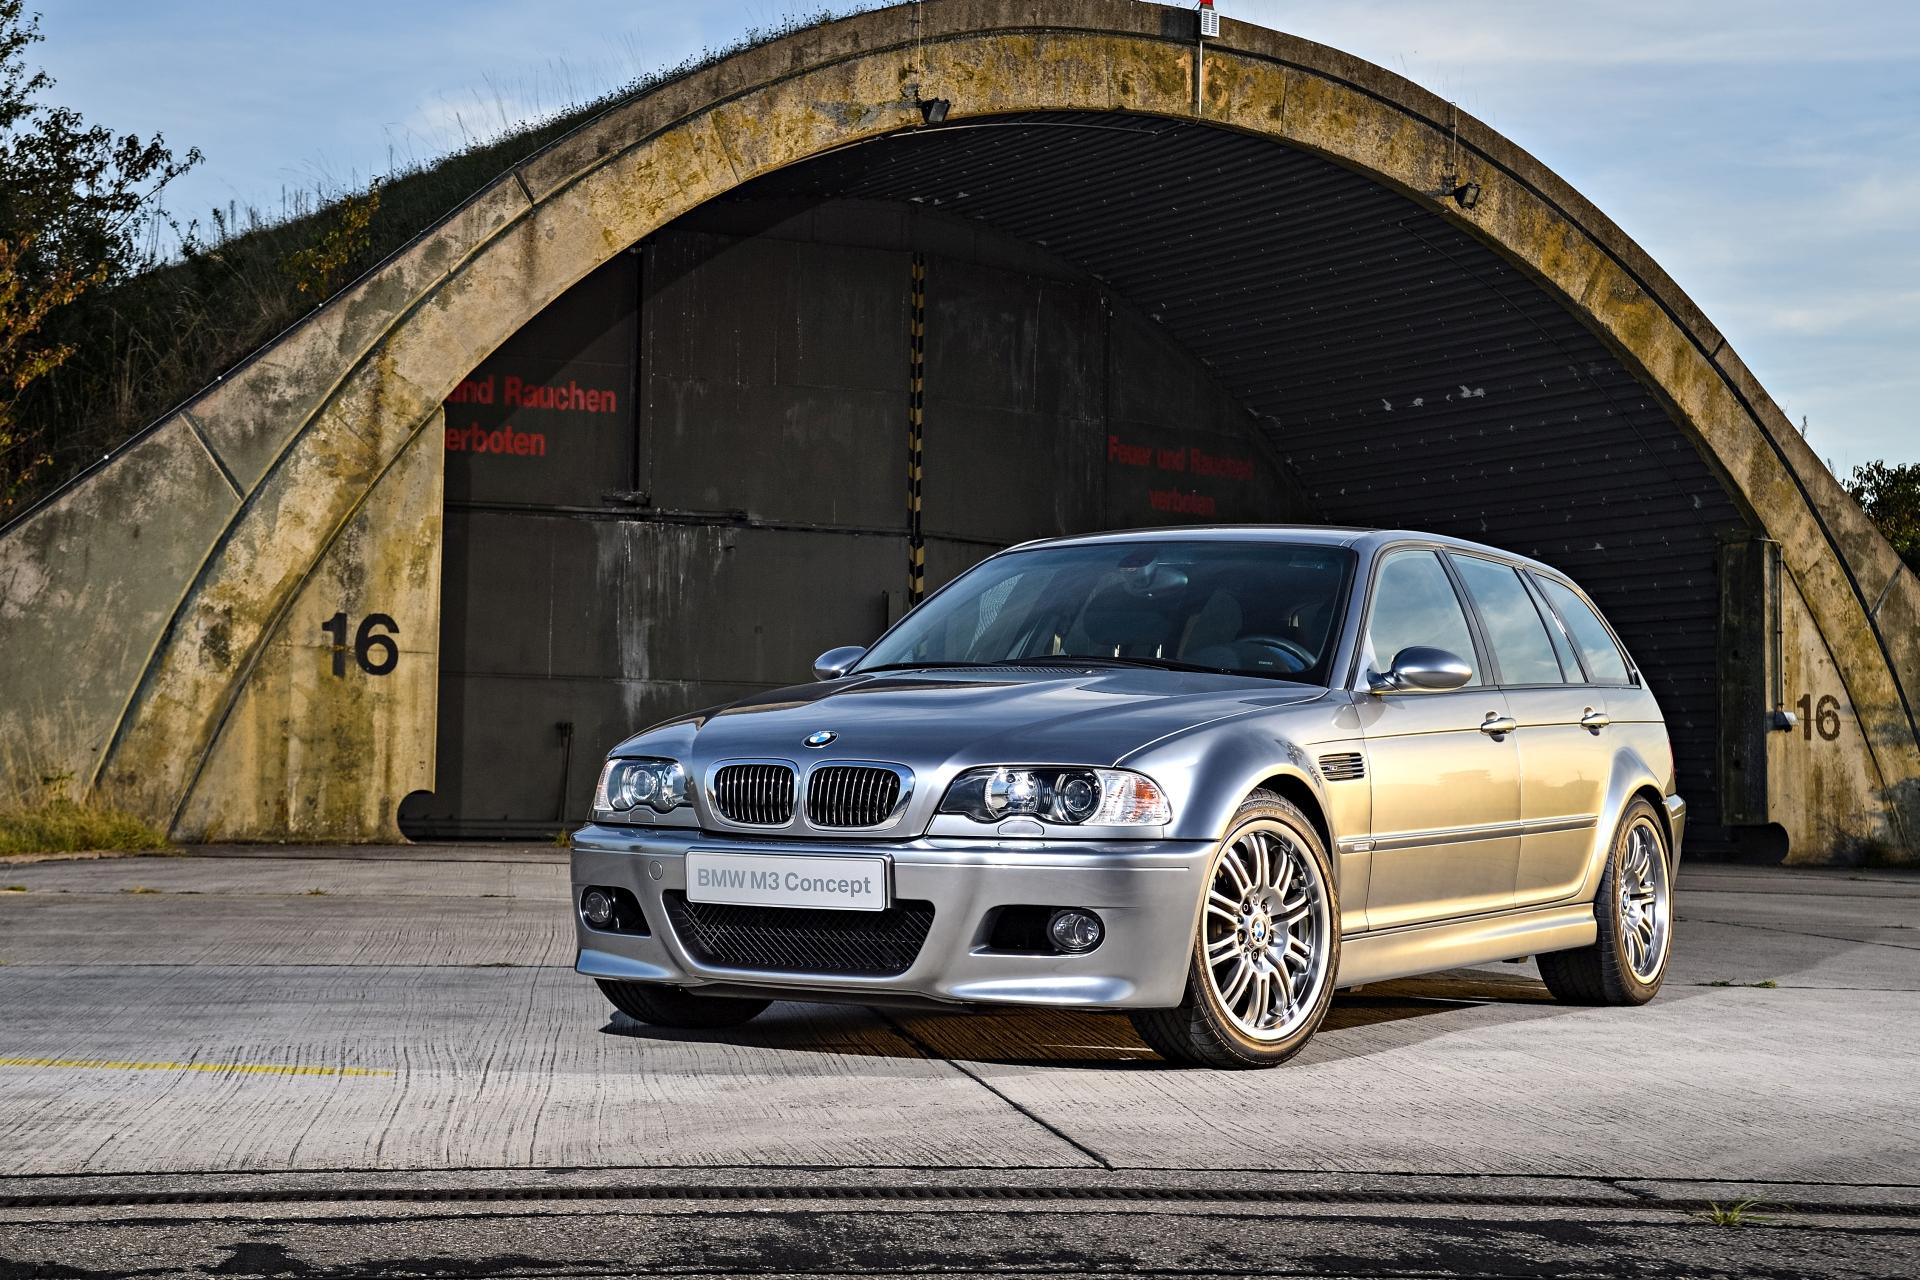 Secret BMW M372